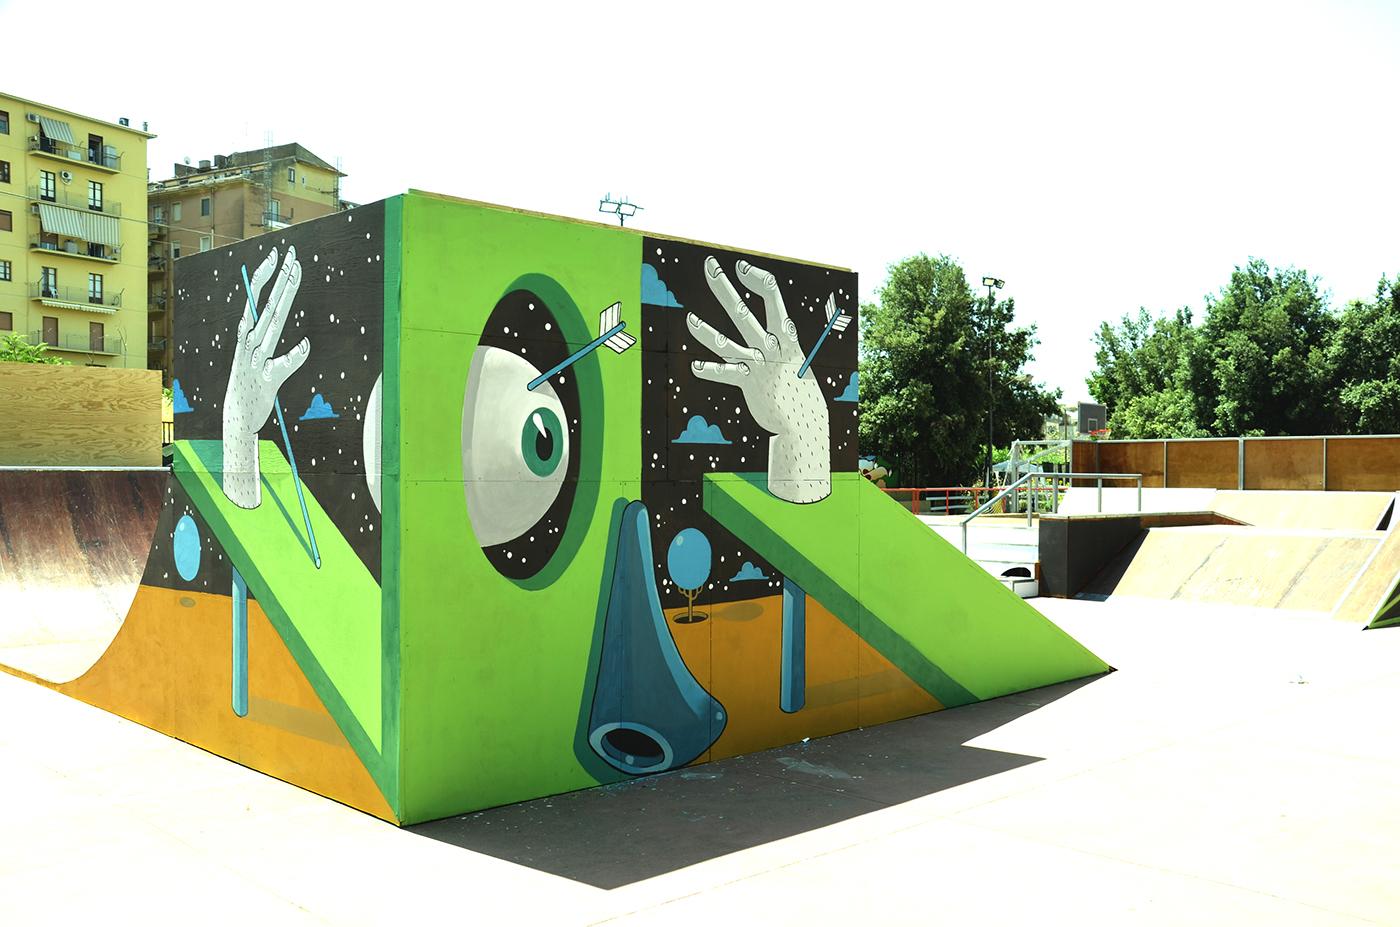 diego della posta mister thoms street art skatepark5 - Mister Thoms : skatepark arty et fresque 3D